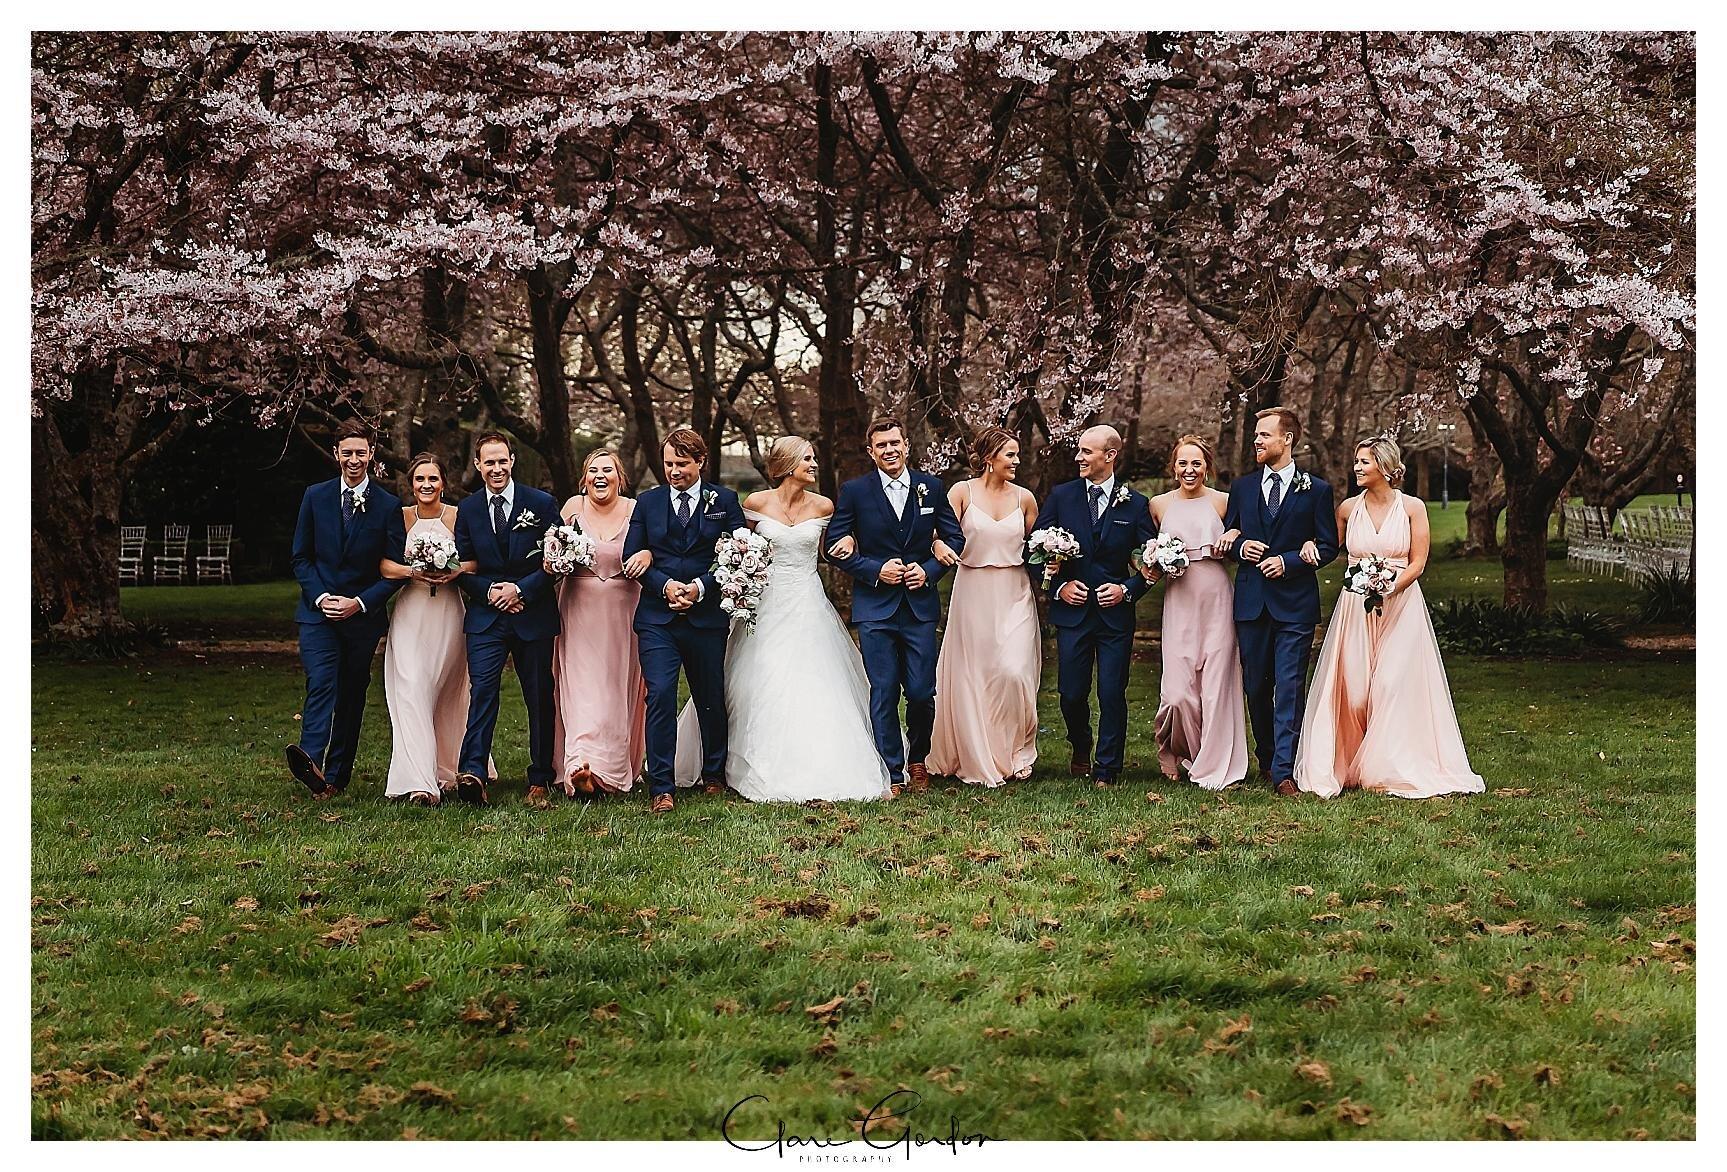 Henley-Hotel-Cherry-blossom-wedding-photos (59).jpg